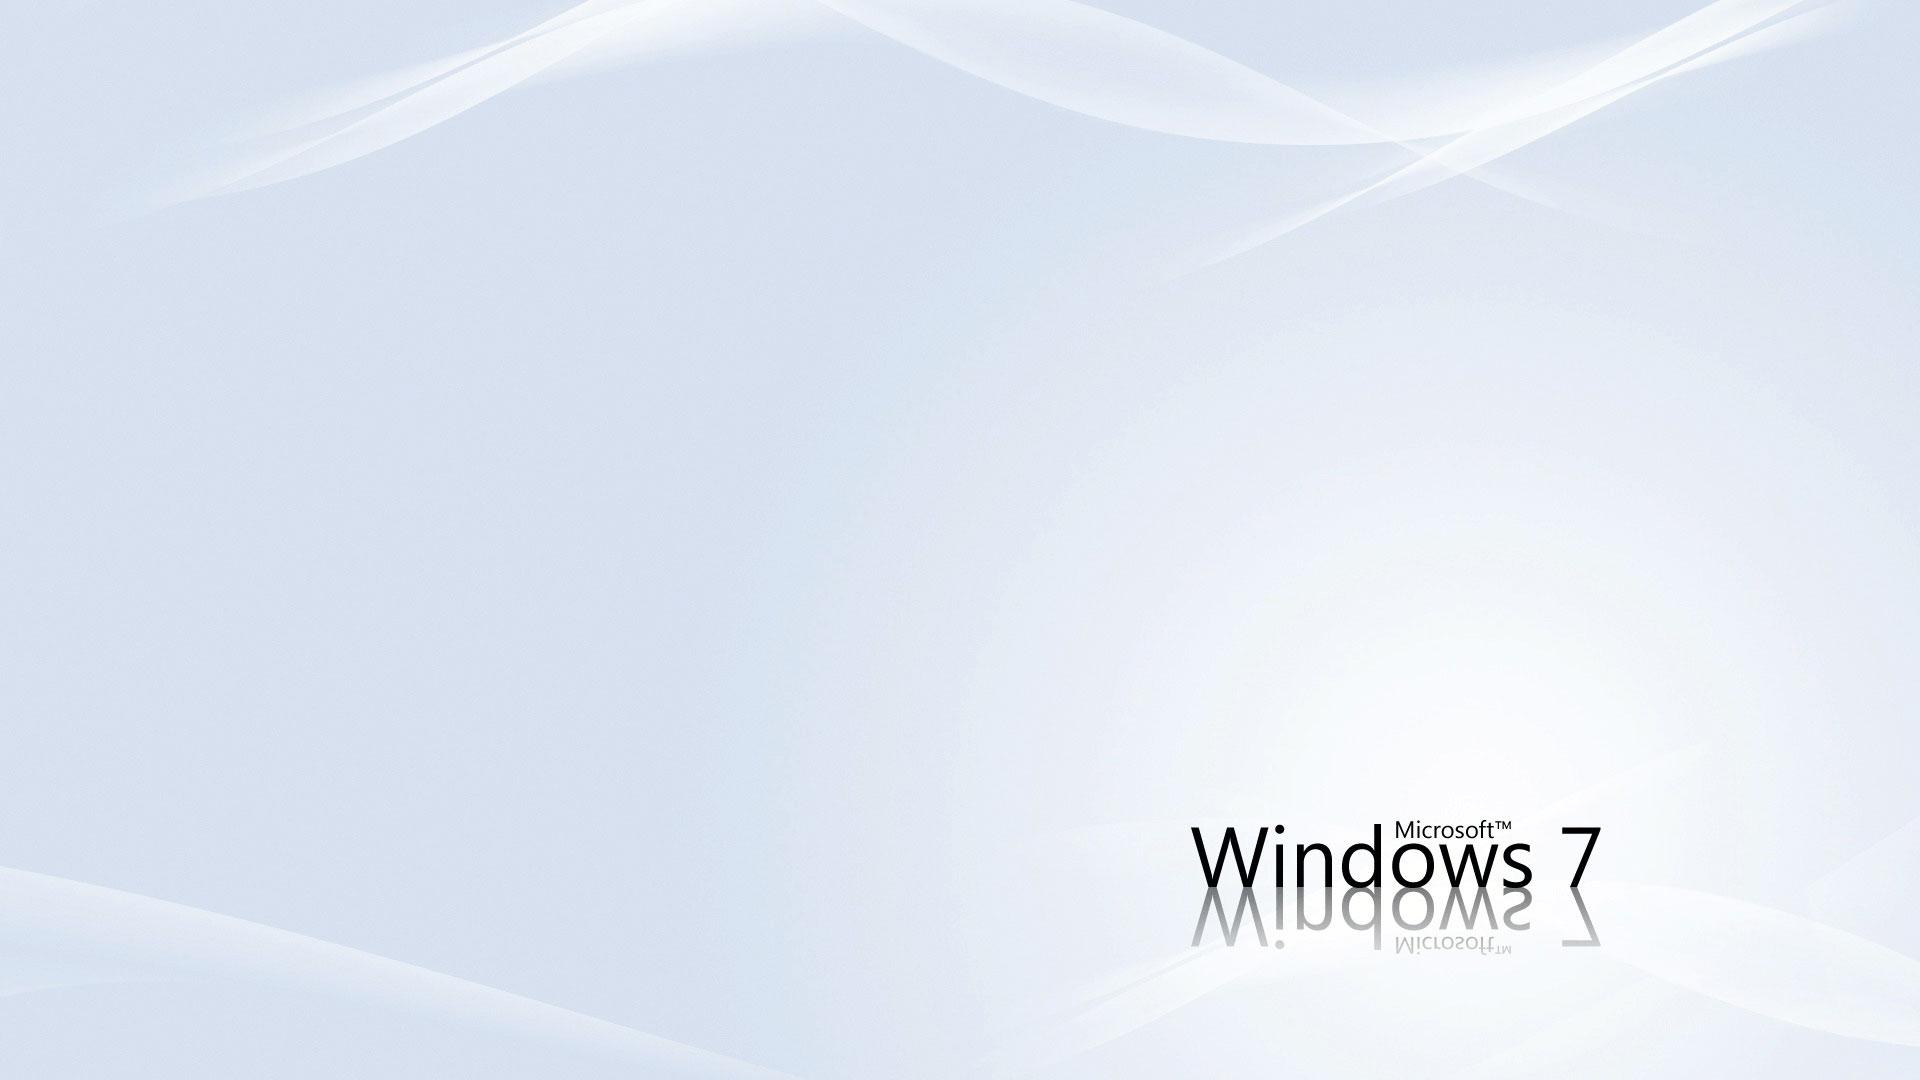 Светлый windows 7 картинки фото обои для